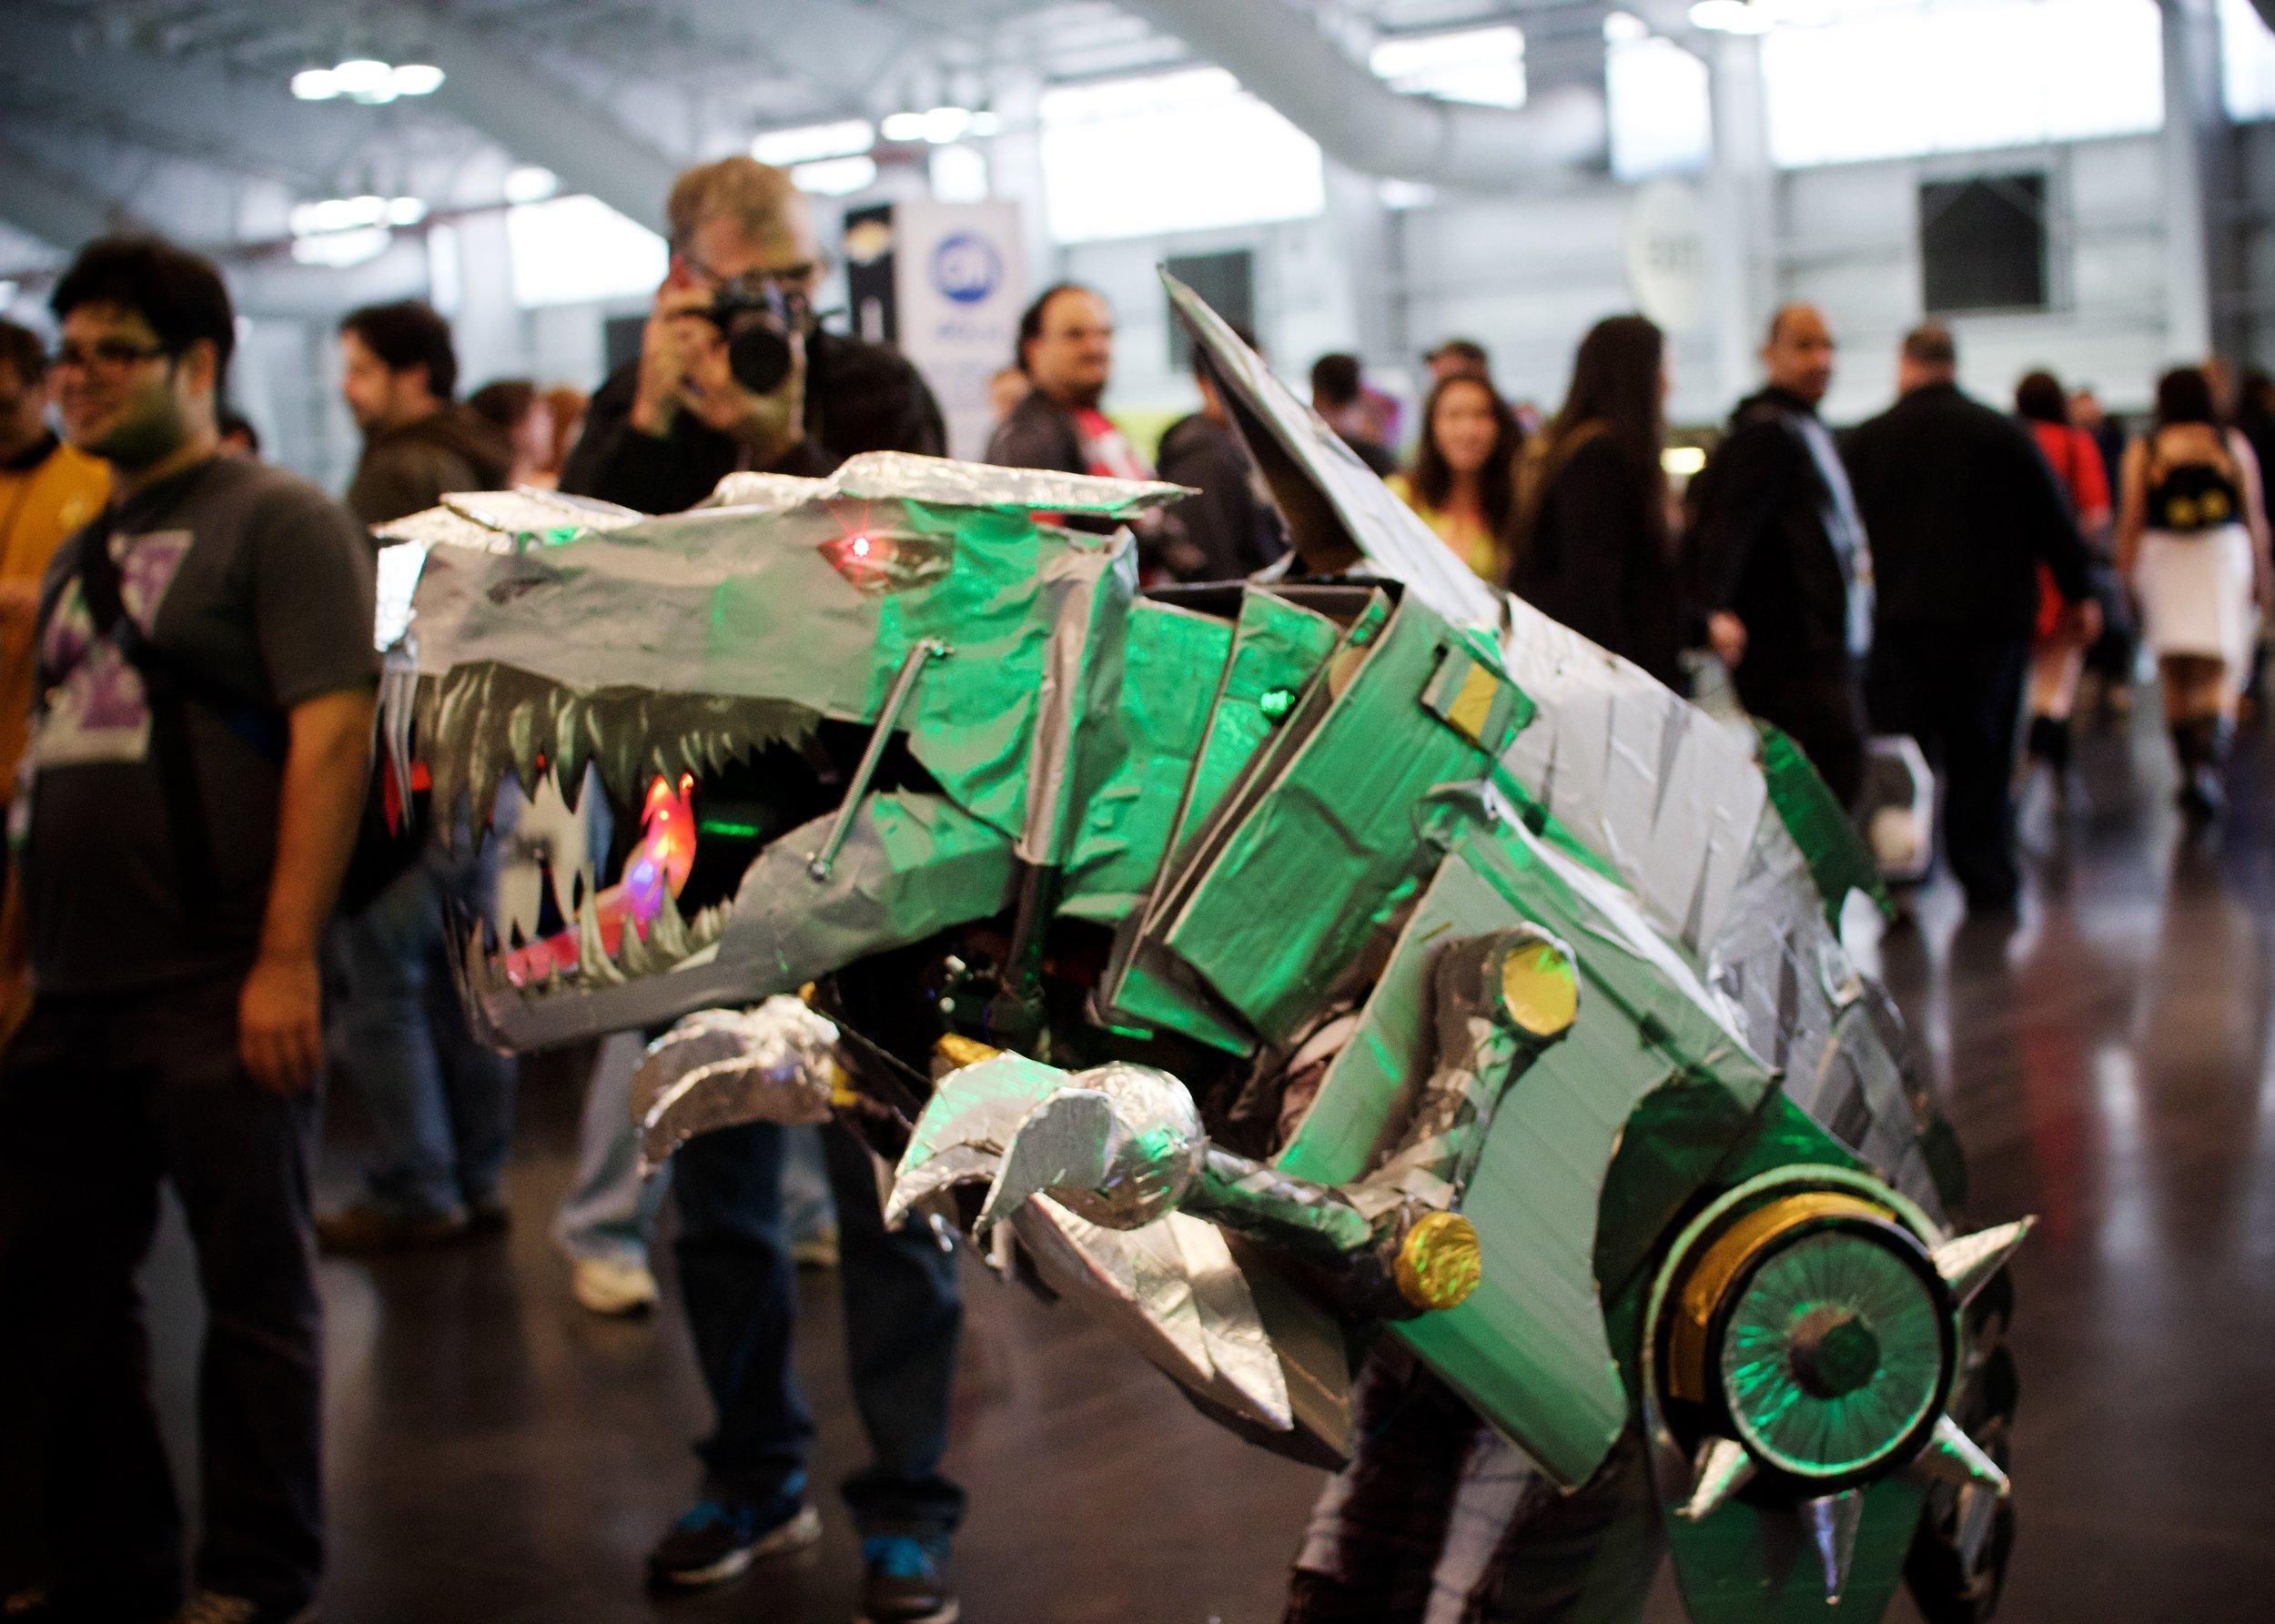 Transformer Loose in Artist Alley